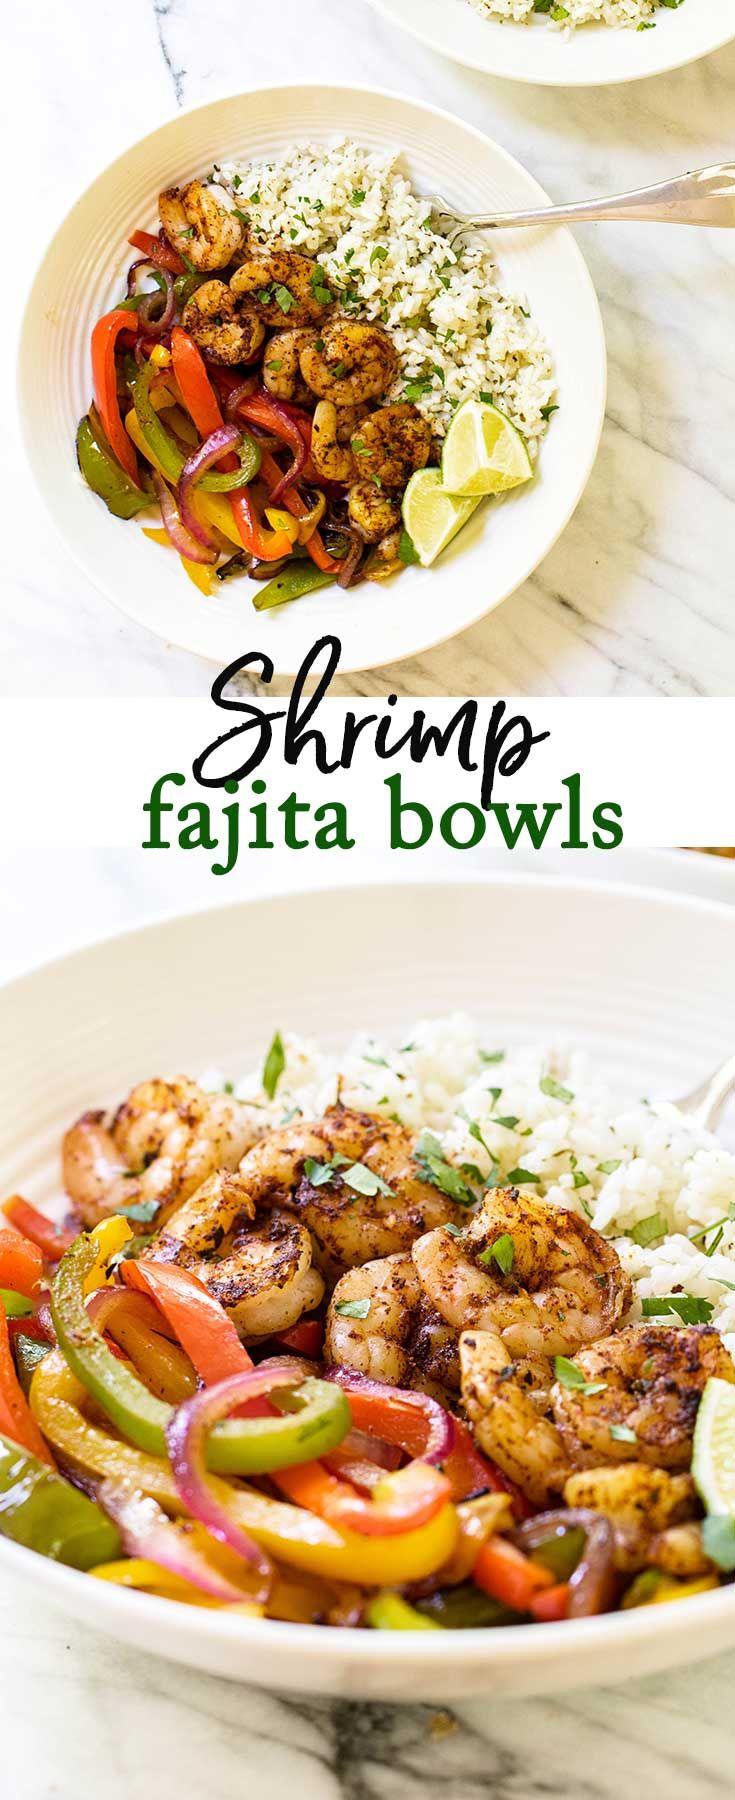 Skip the tortillas and serve shrimp fajitas over a bed of cilantro lime rice via @april7116